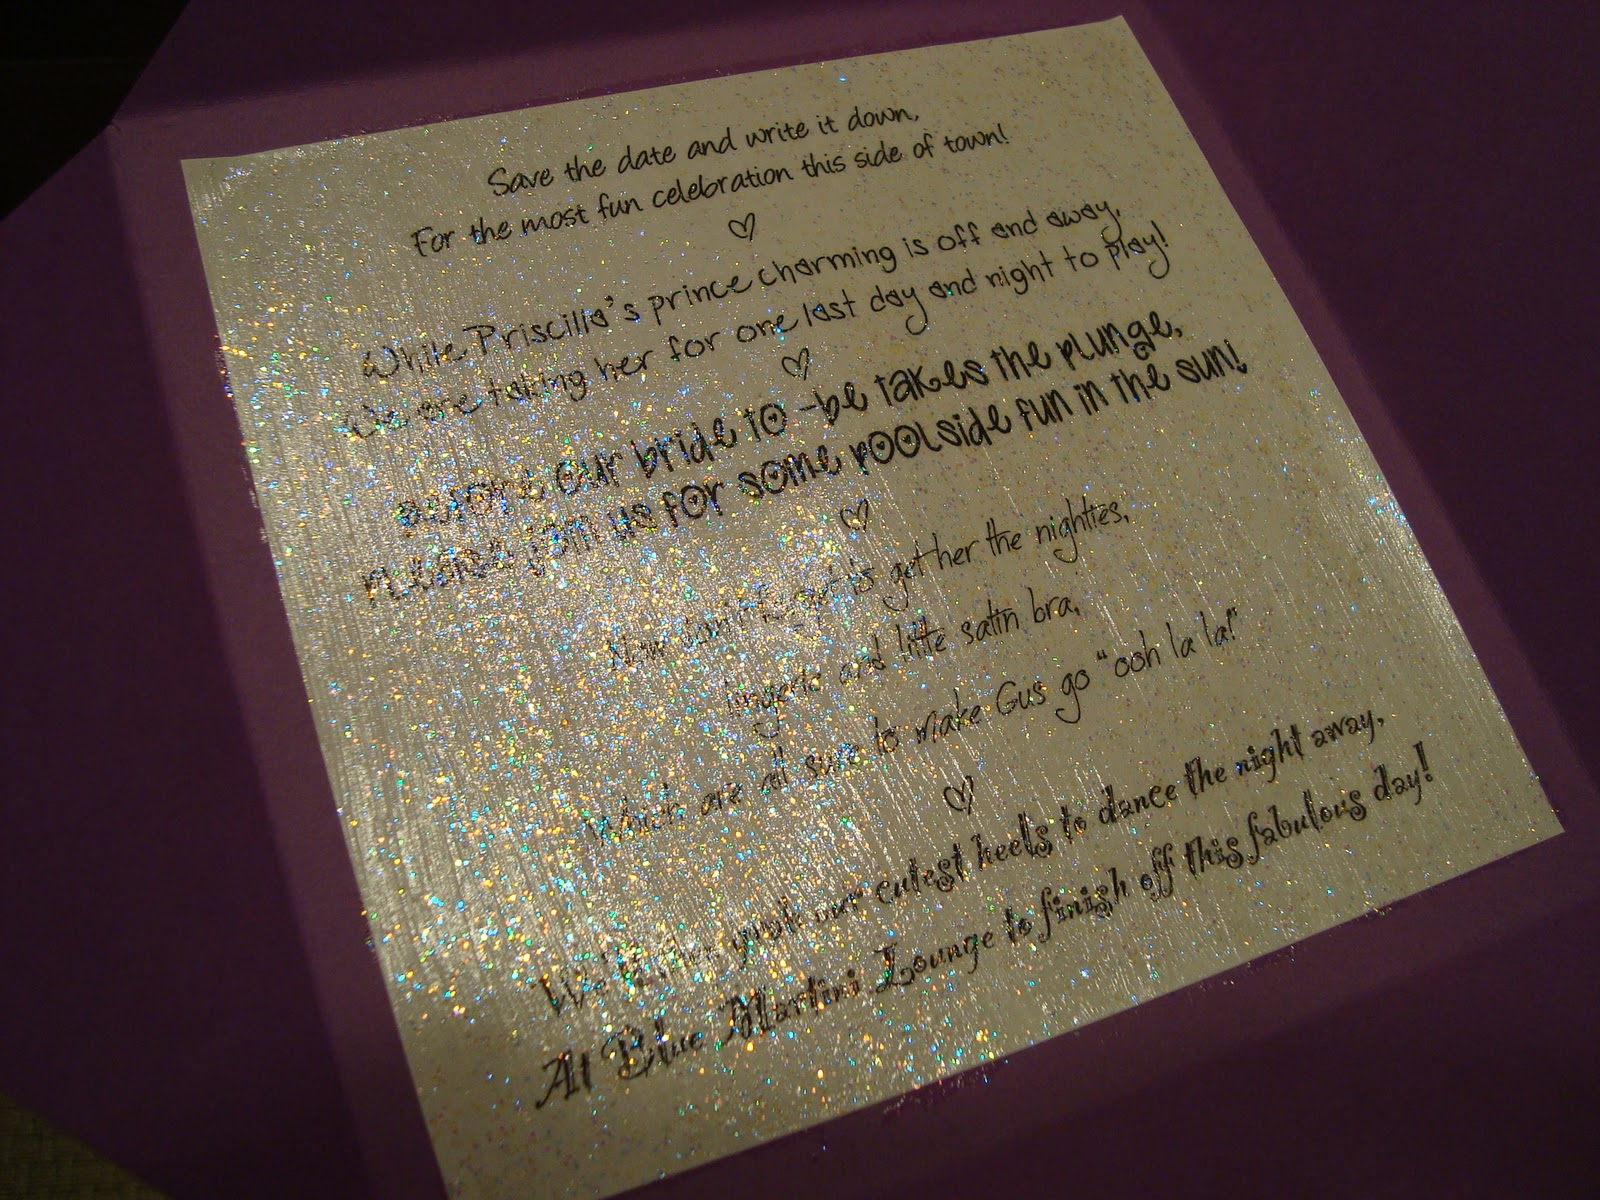 fun wording for bachelorette party invitation - Picture Ideas ...